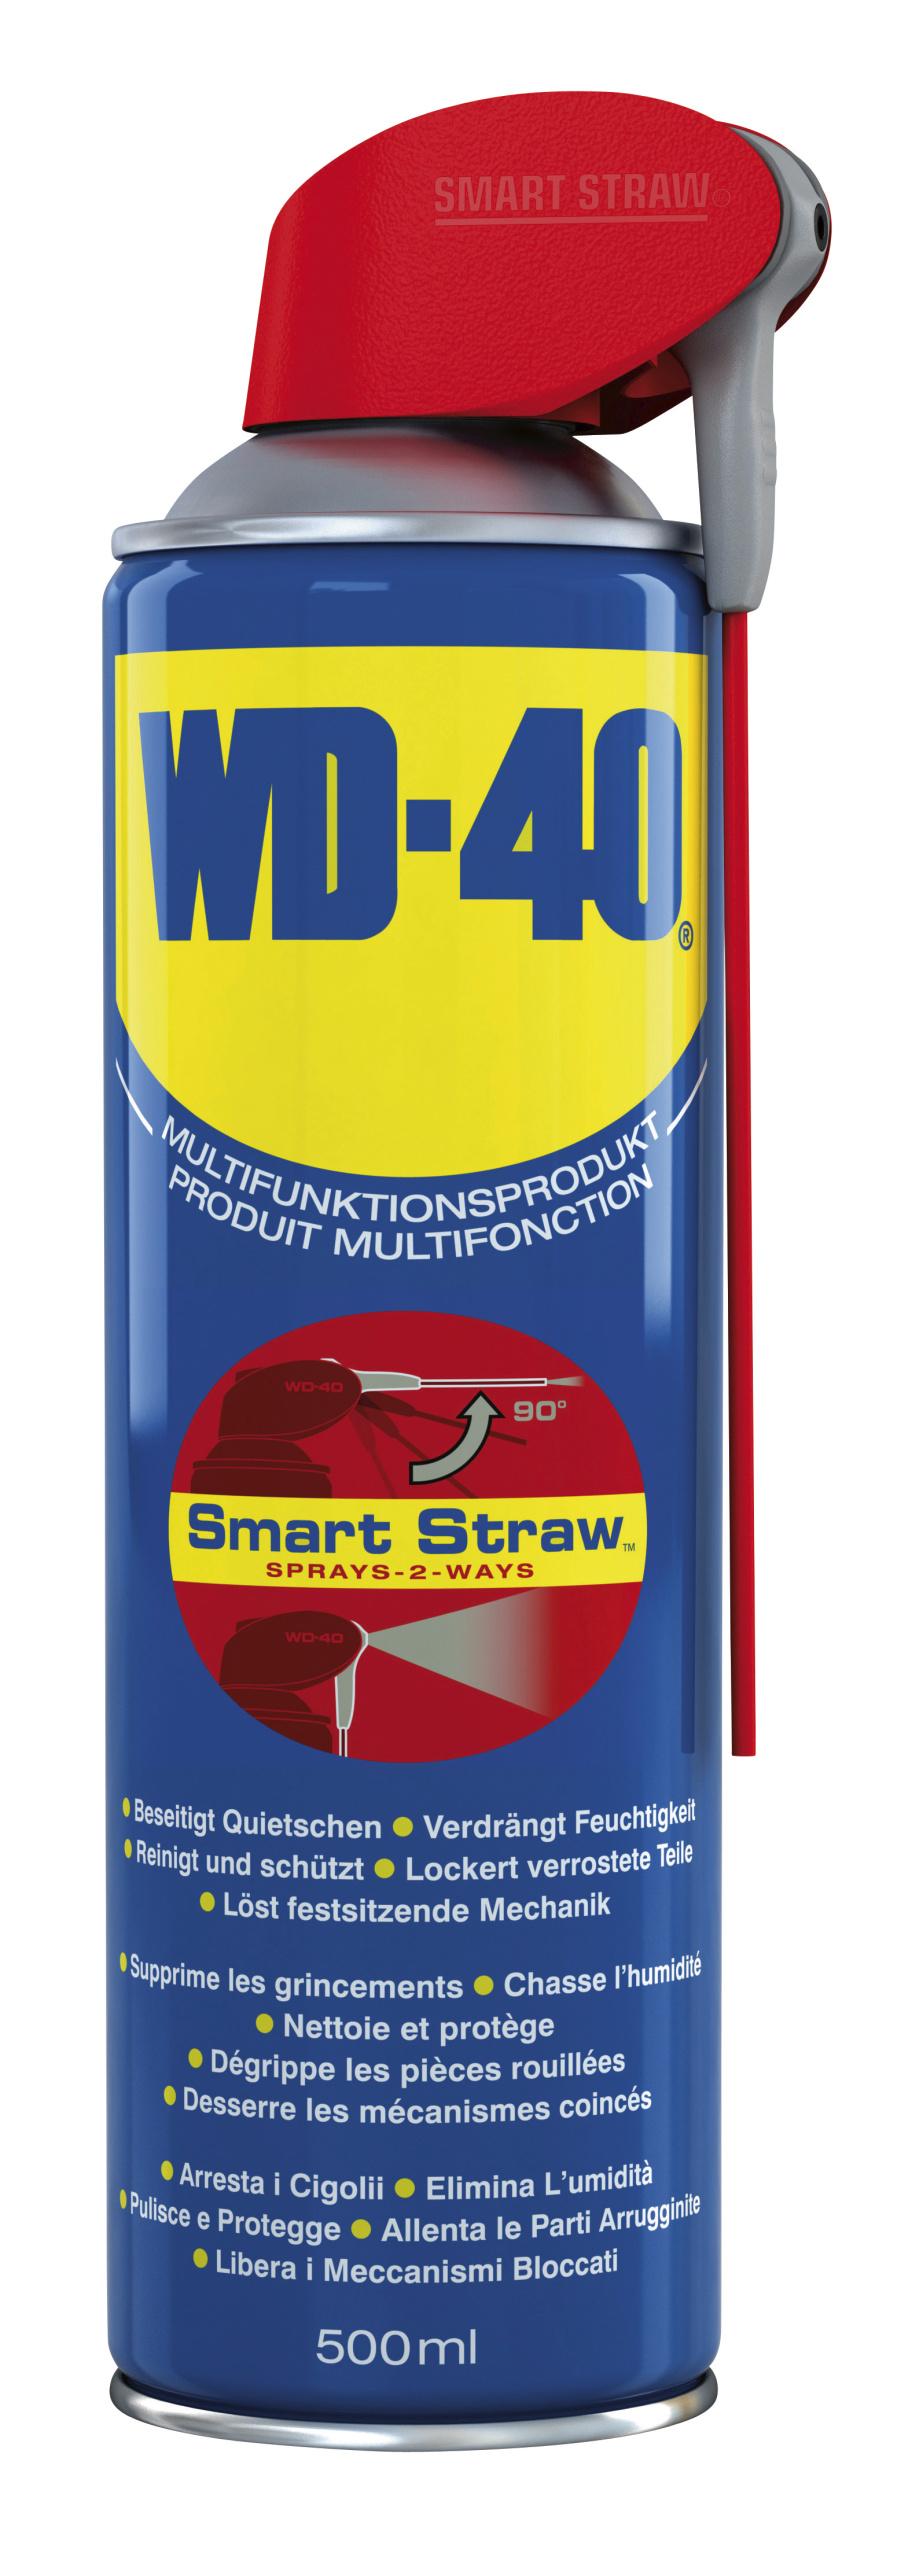 "WD-40 500ml ""Smart-Straw"""